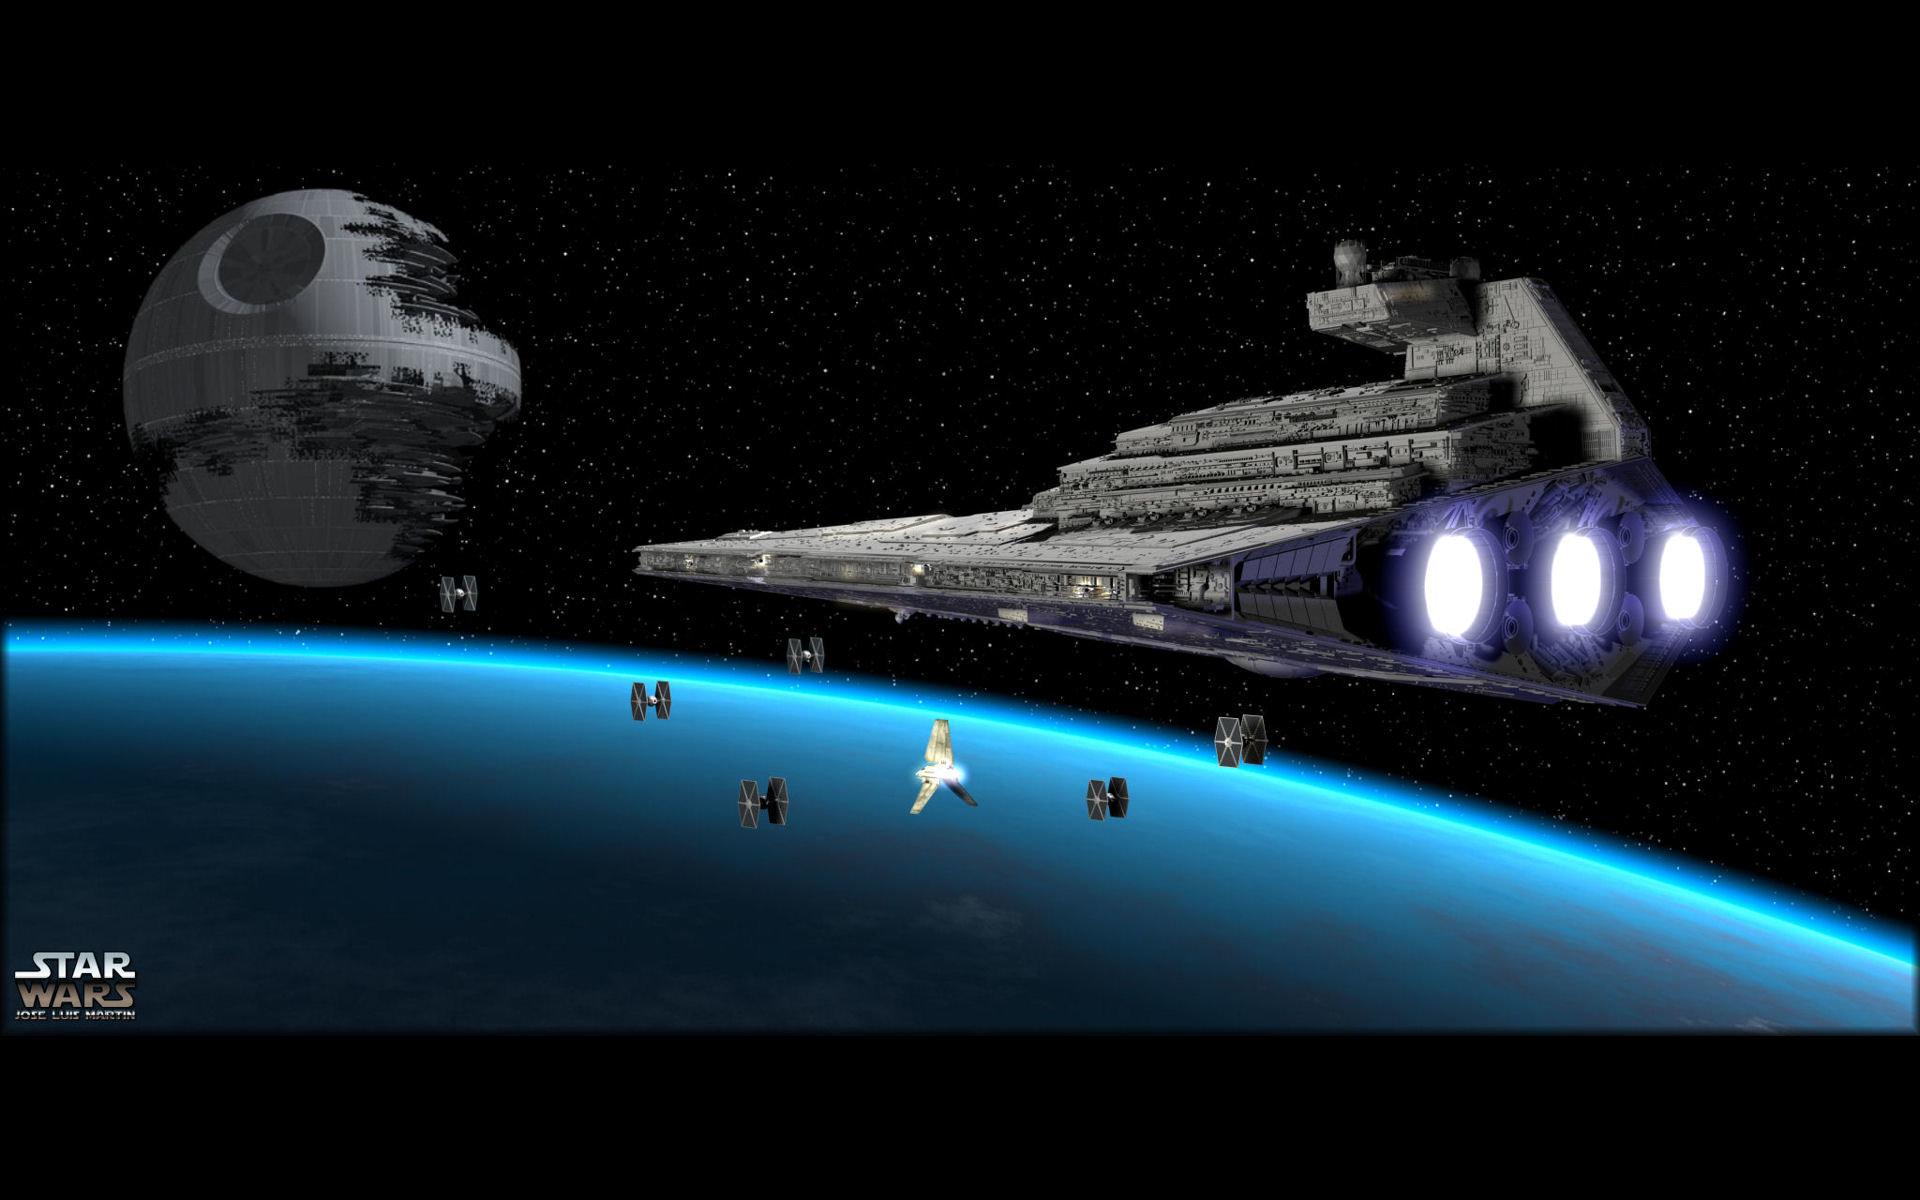 Death Star HD Backgrounds For 1920x1200 Desktop